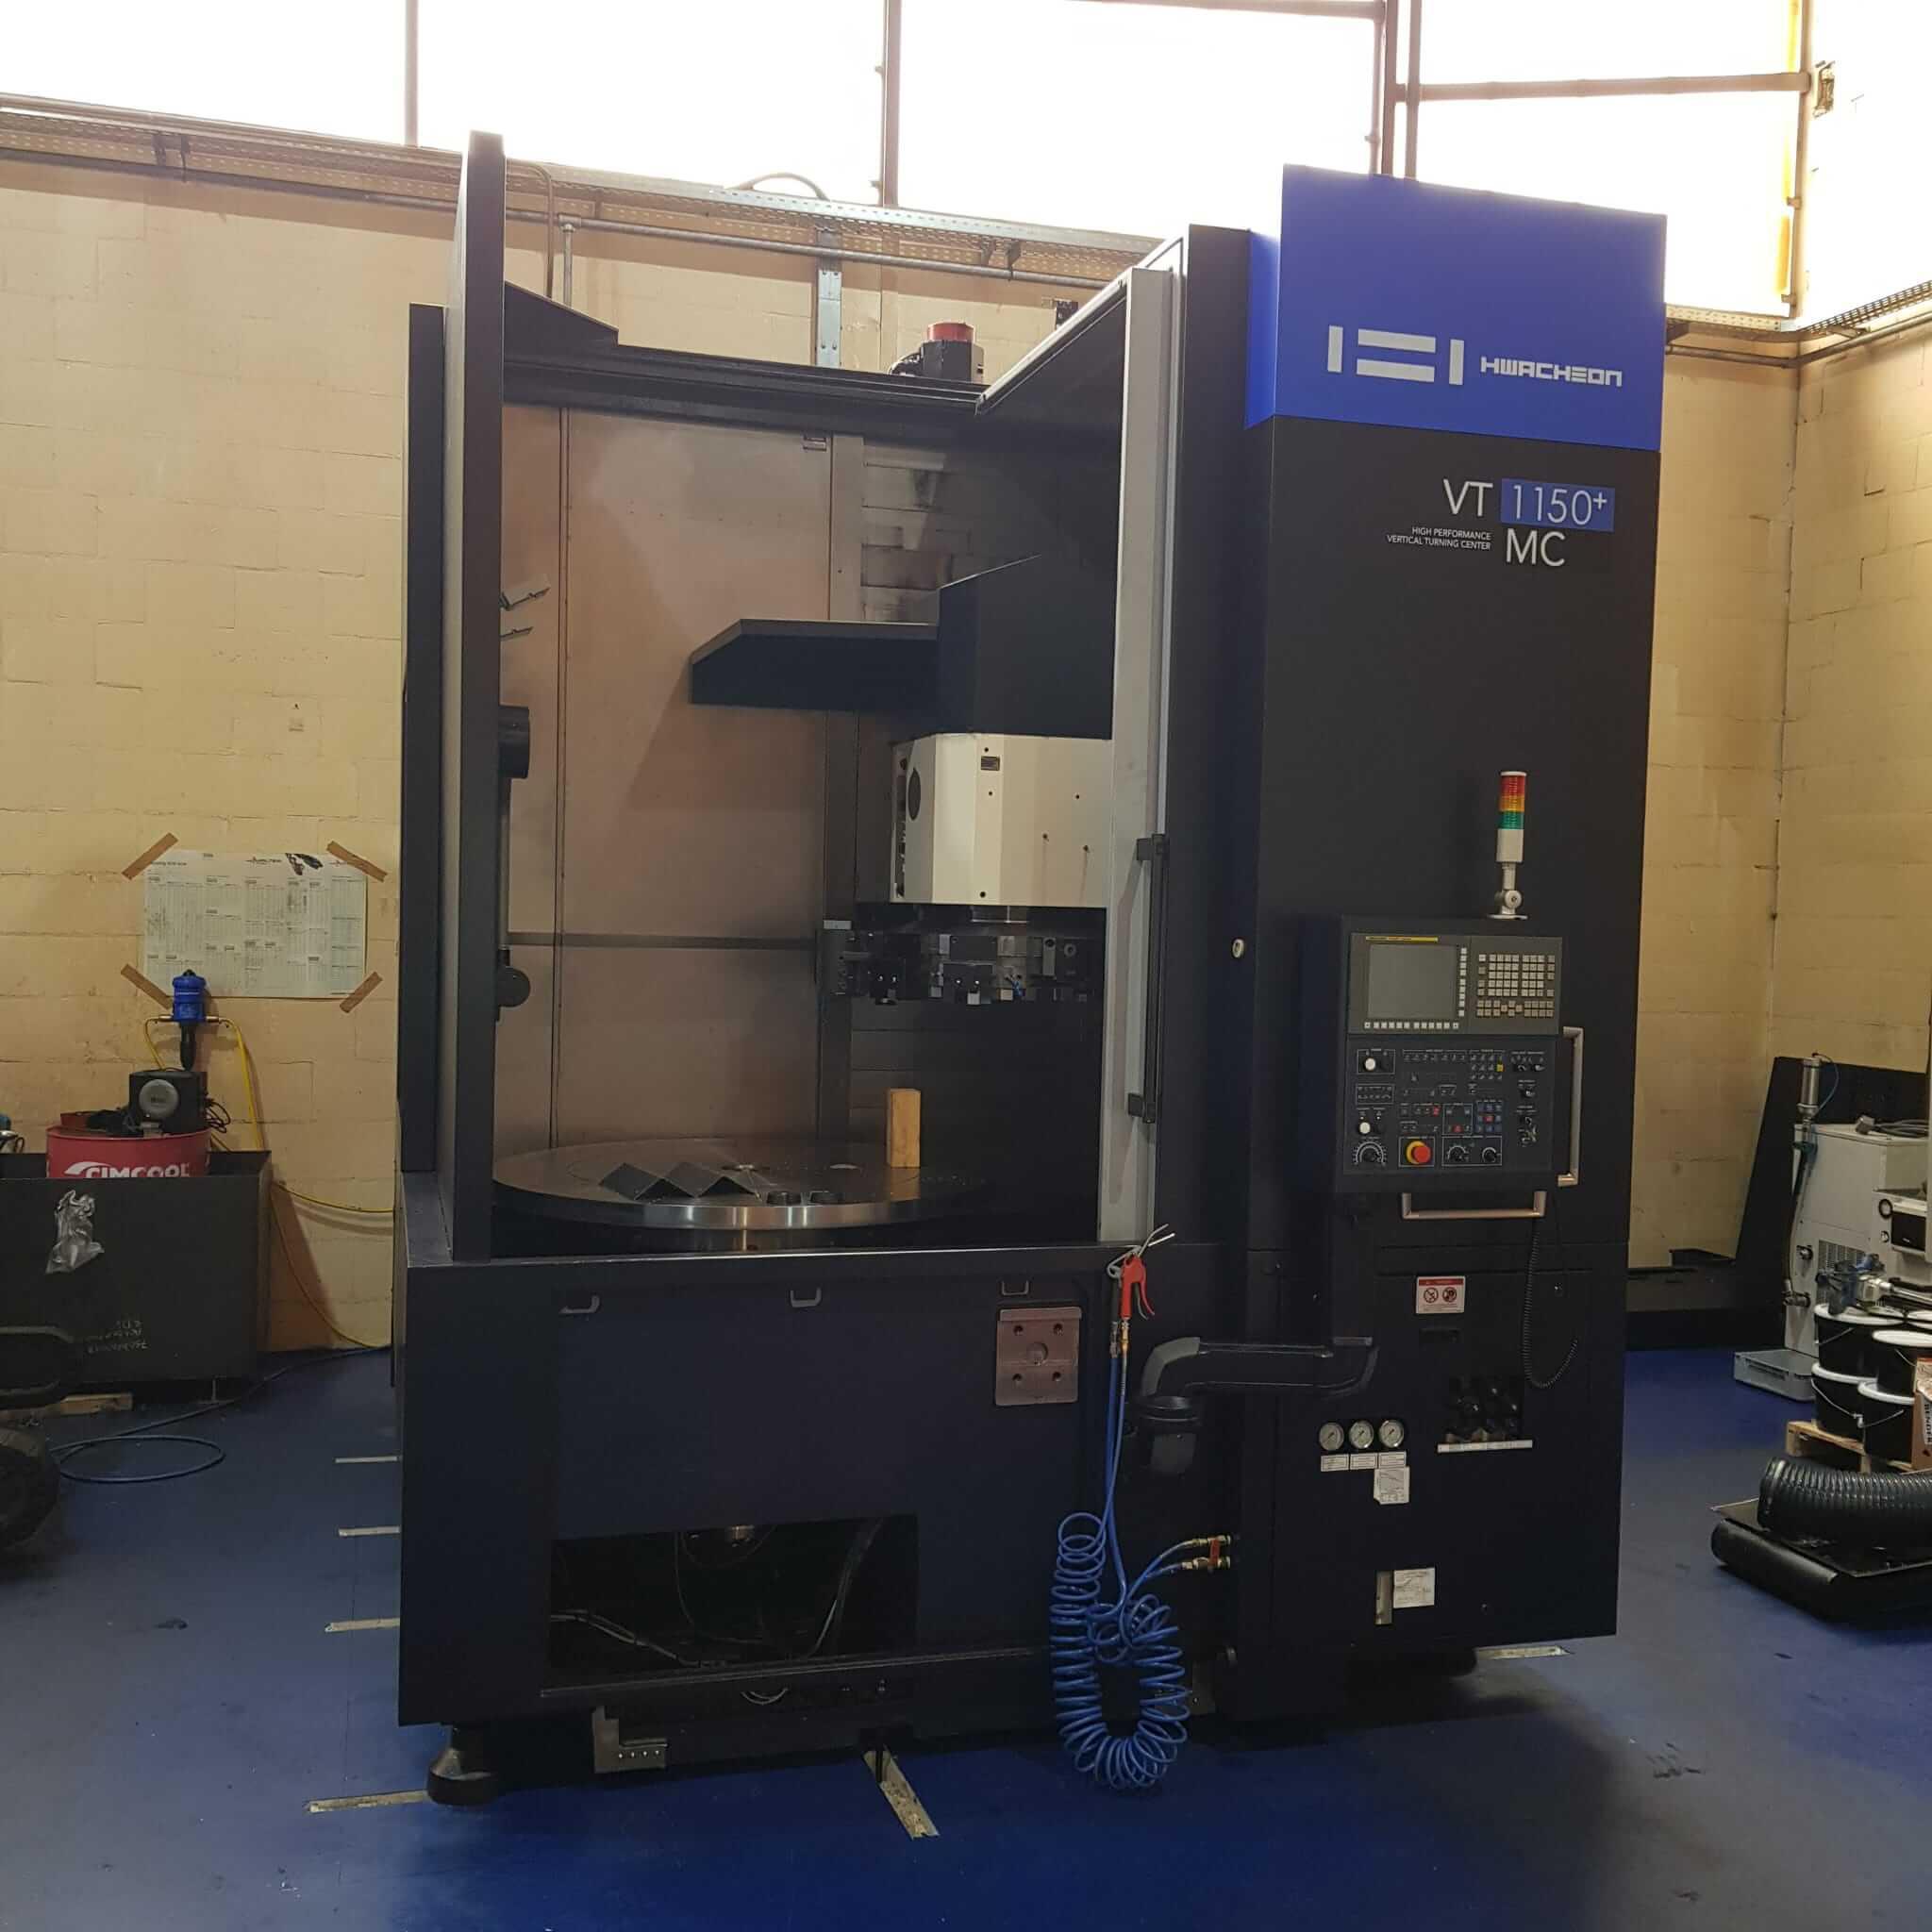 Hwacheon VT1150 - CNC freesmachine